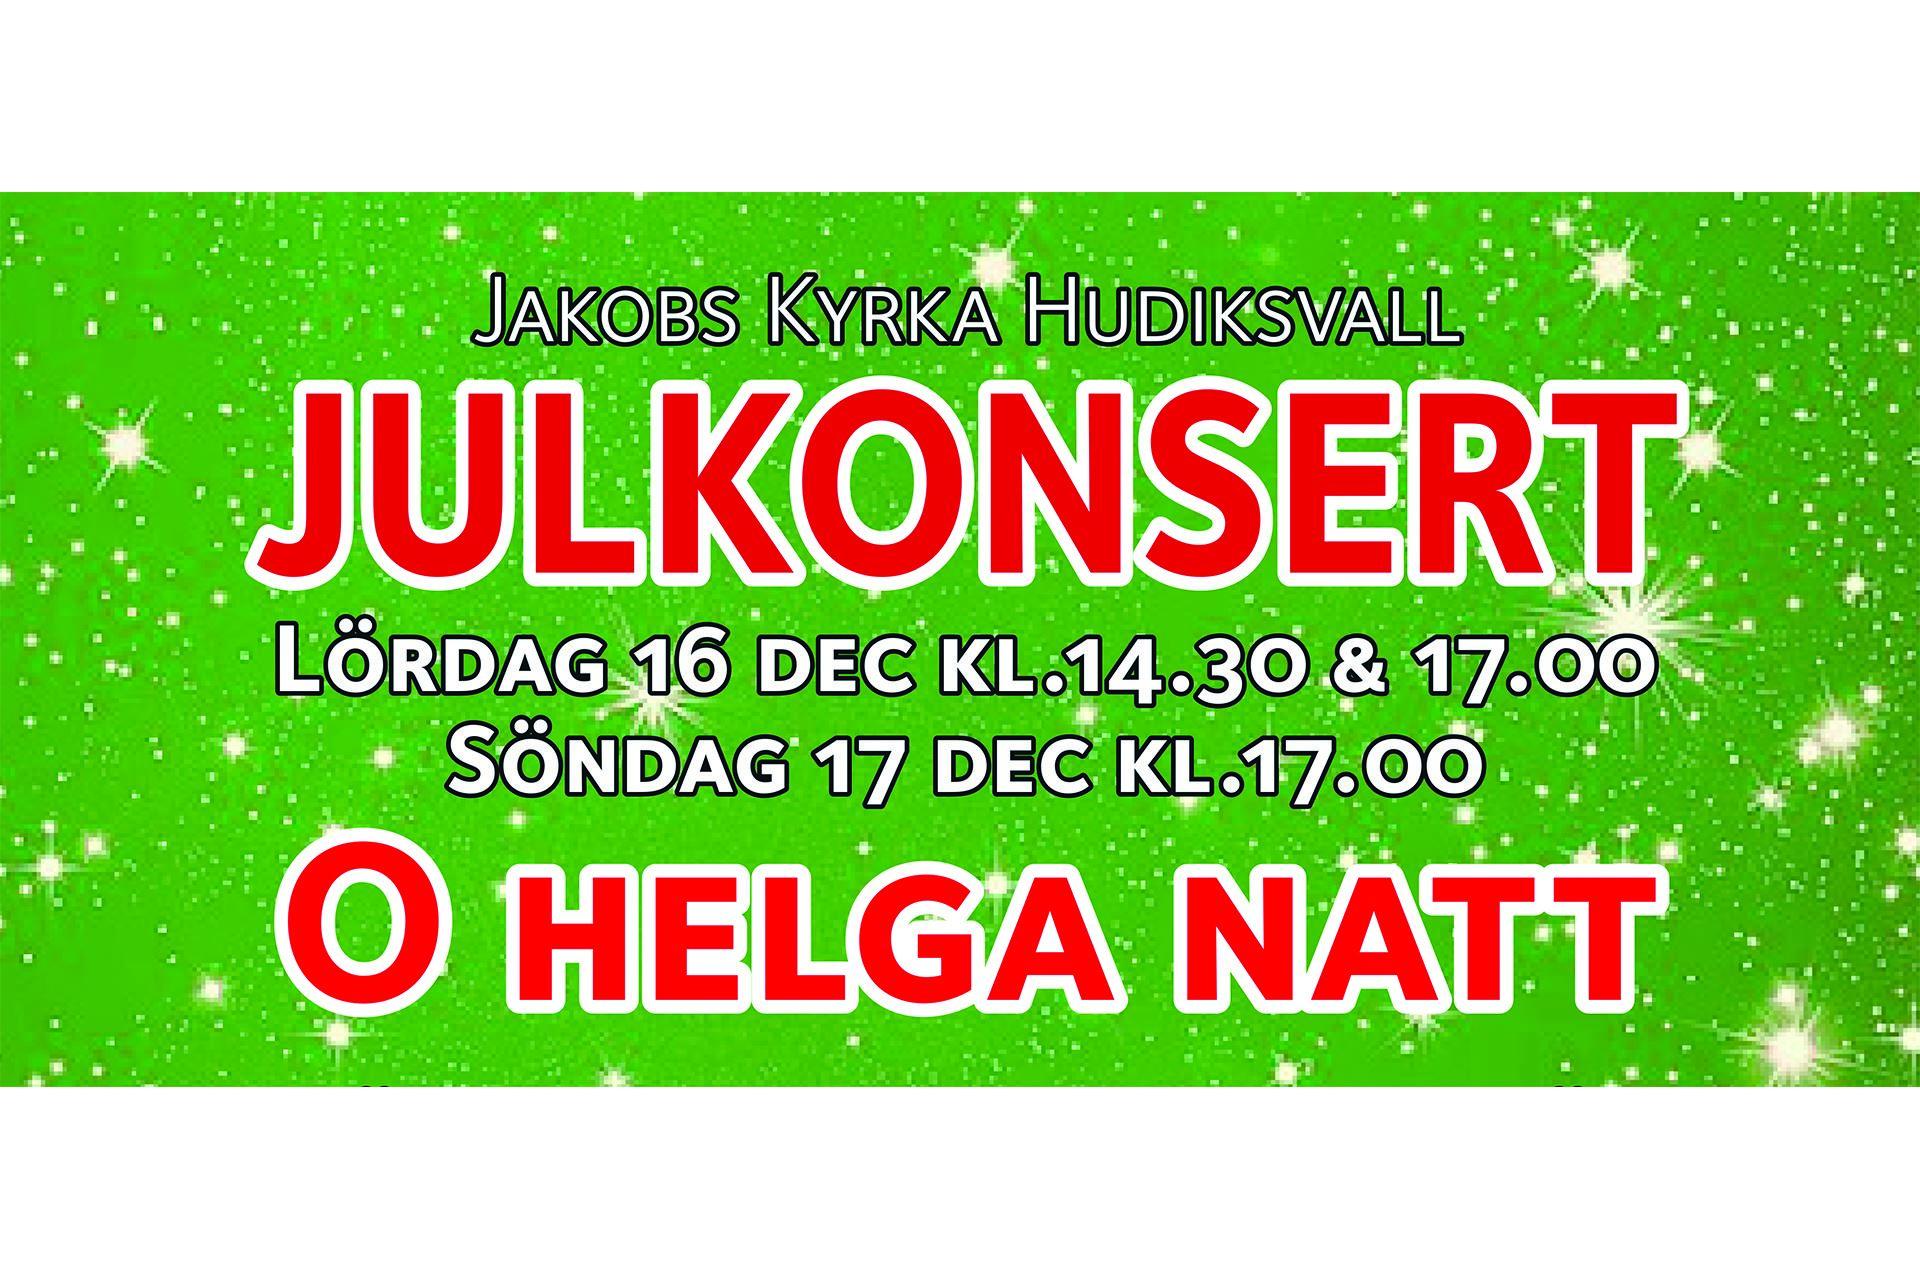 Julkonsert O Helga Natt